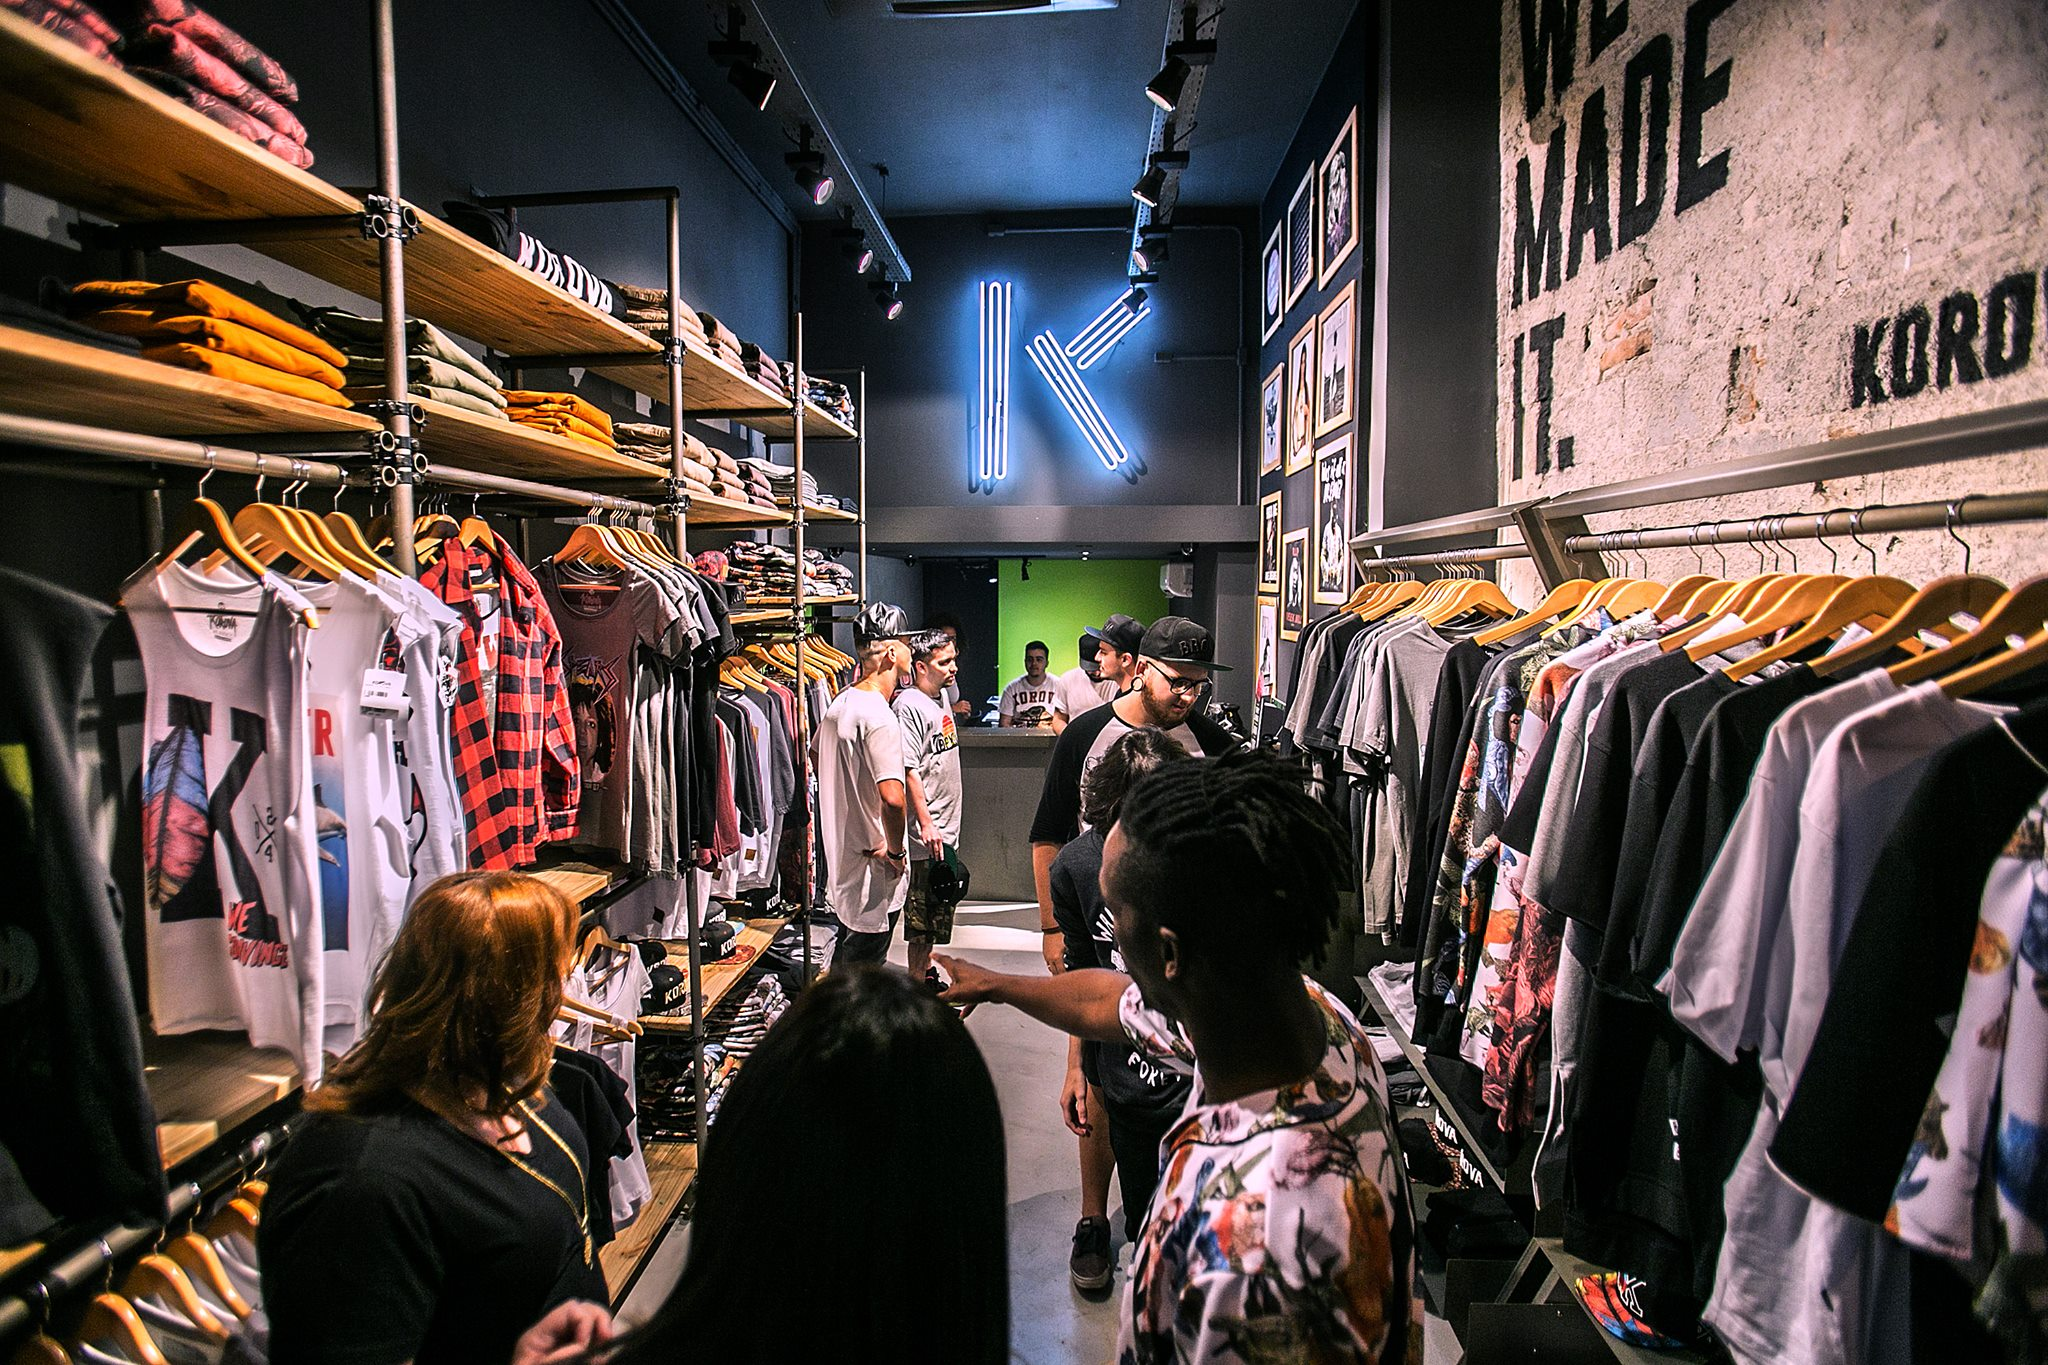 Loja de moda urbanwear se destaca por estampas exclusivas feitas na hora